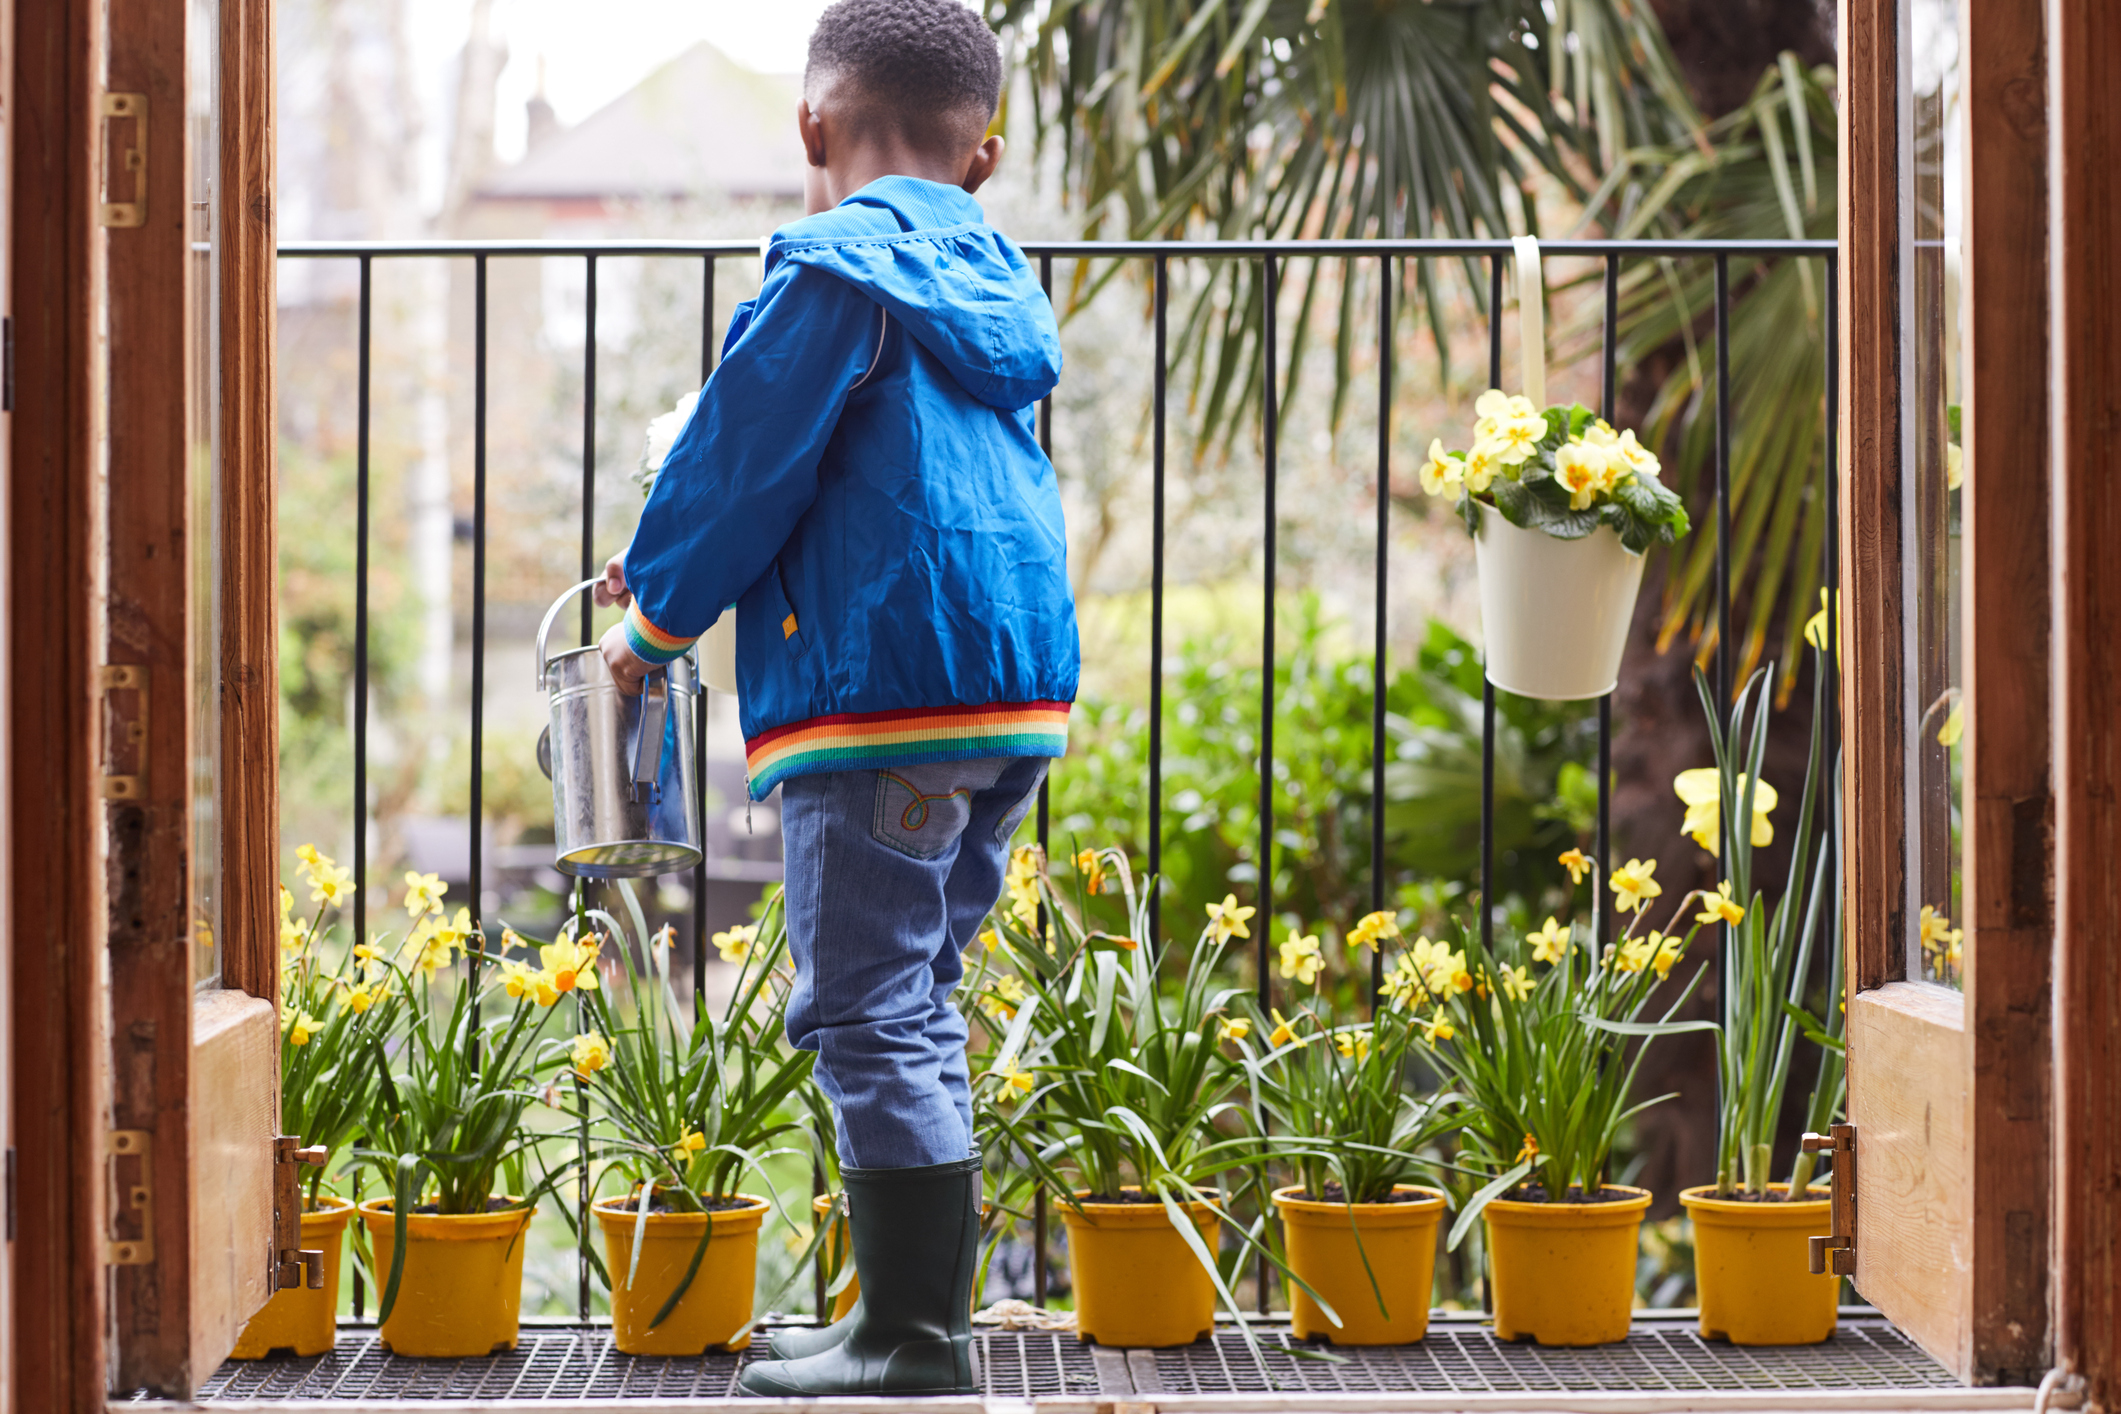 Boy watering the plants